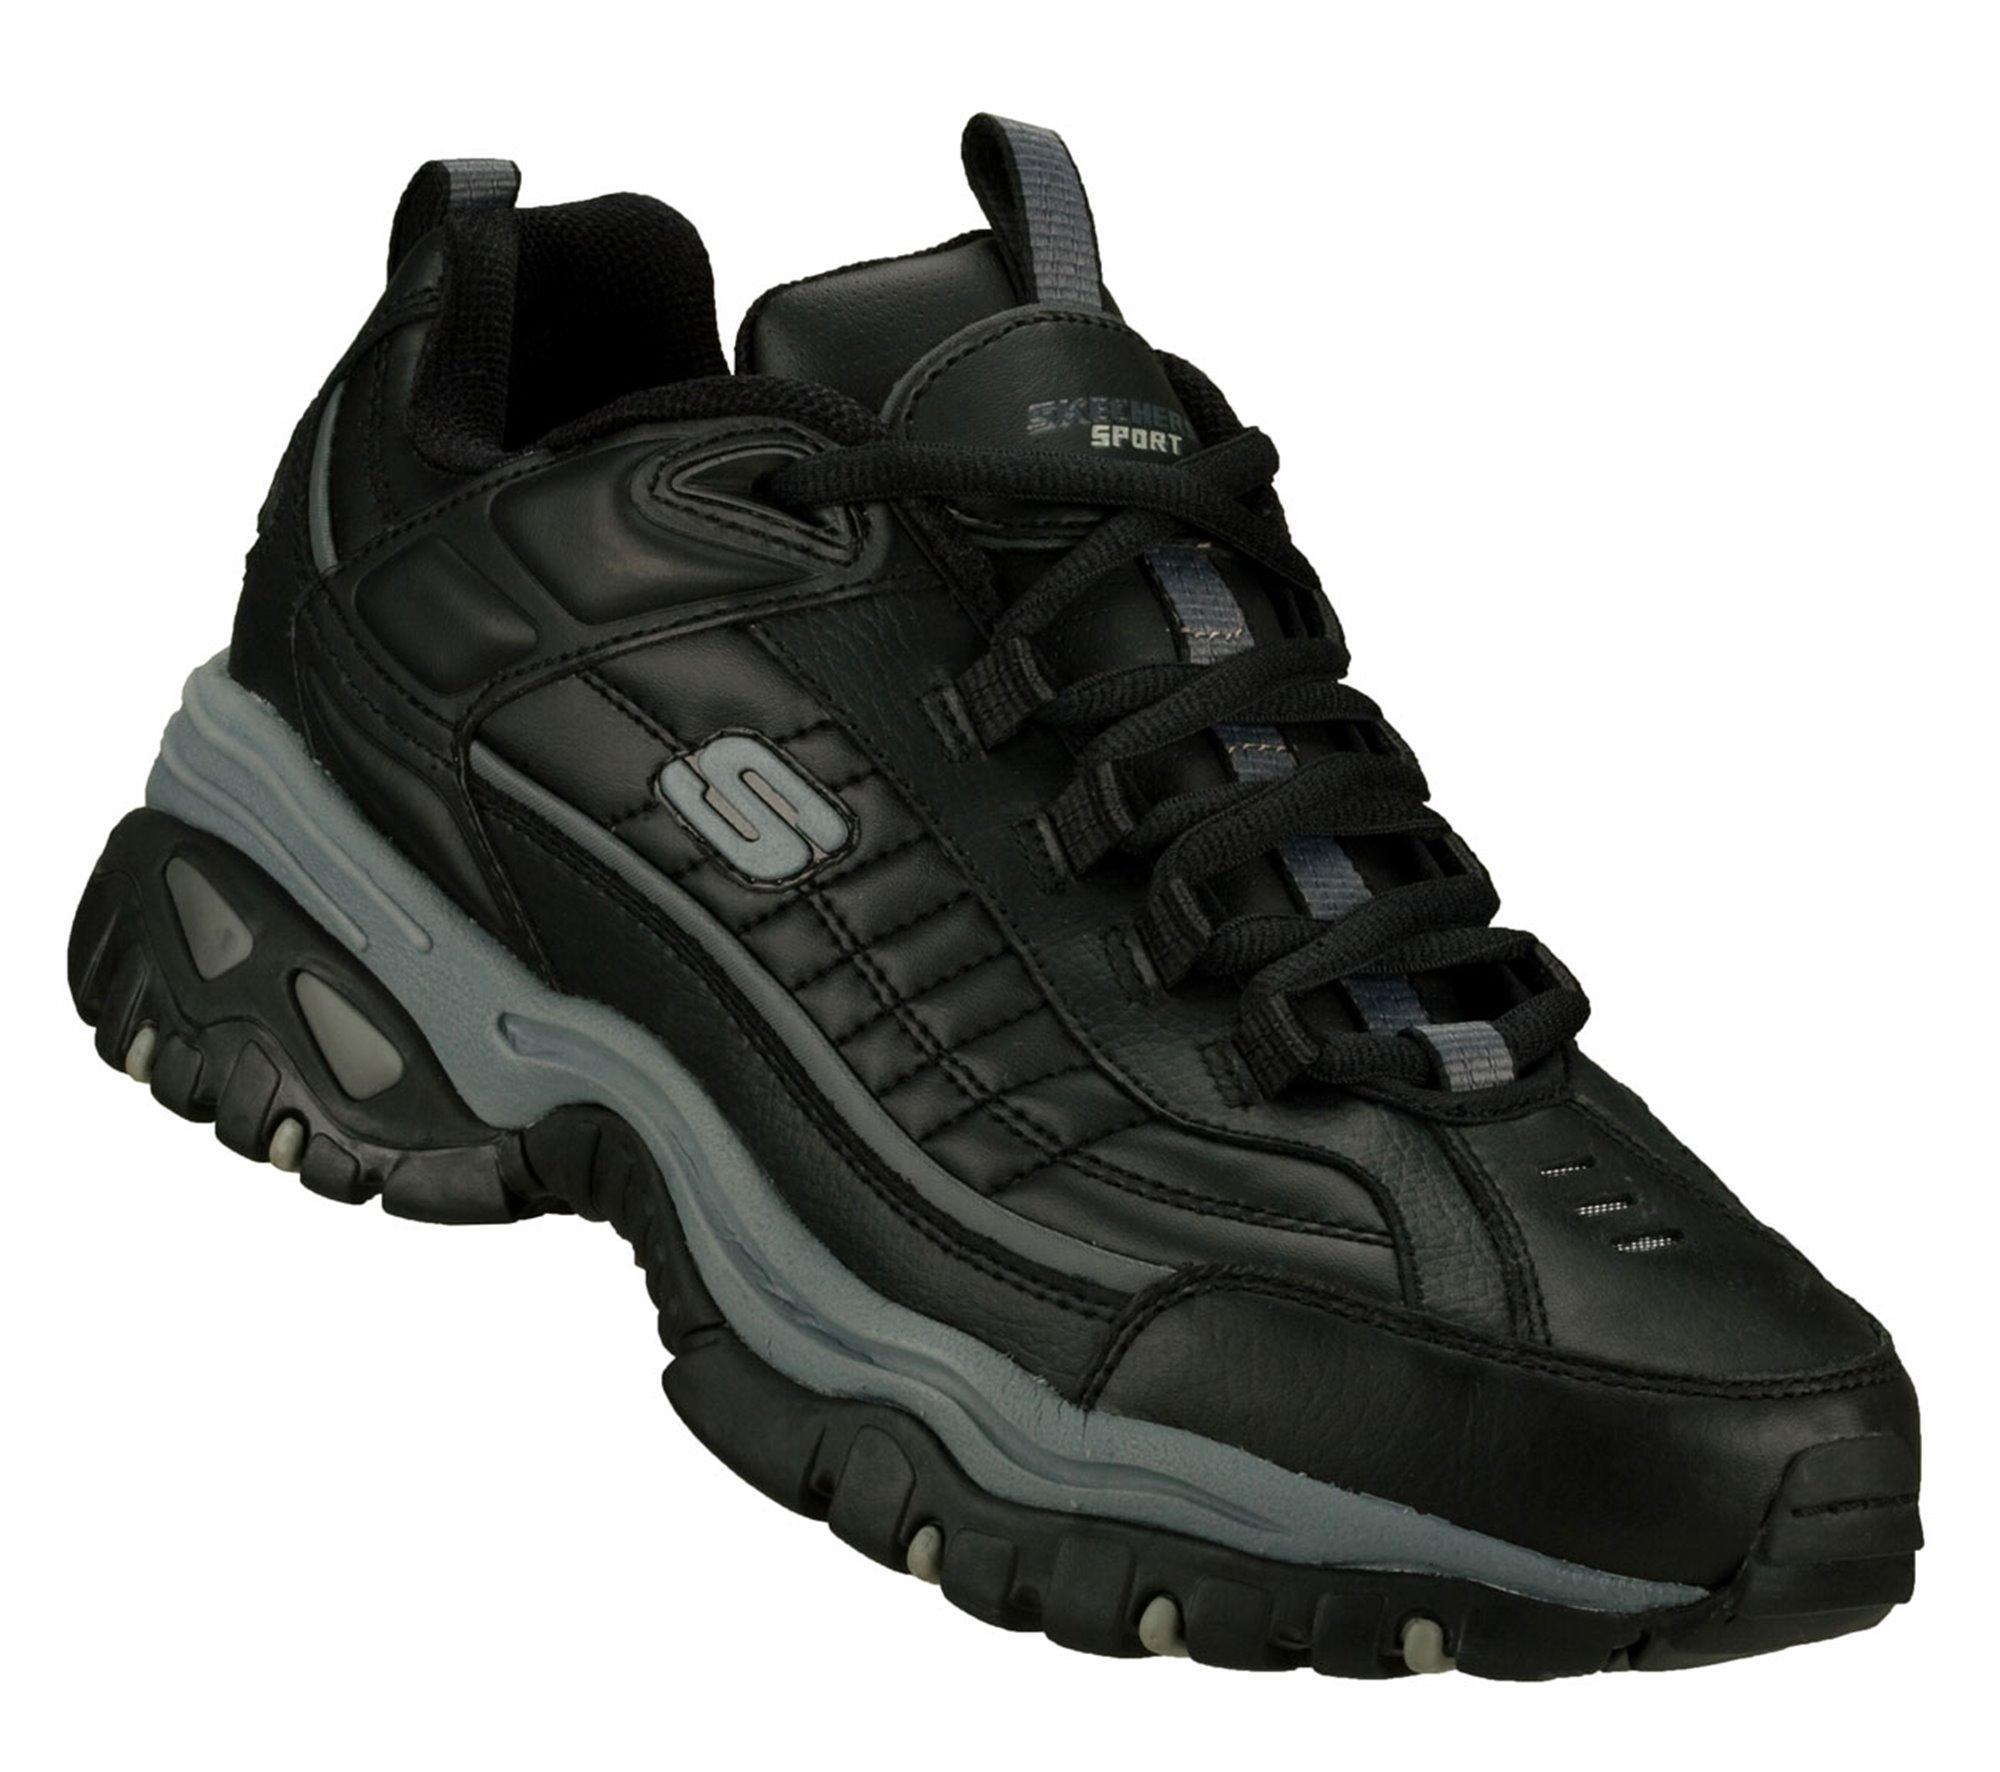 2c05e88bde1f5f Lyst - Skechers Energy - After Burn in Black for Men - Save 3%